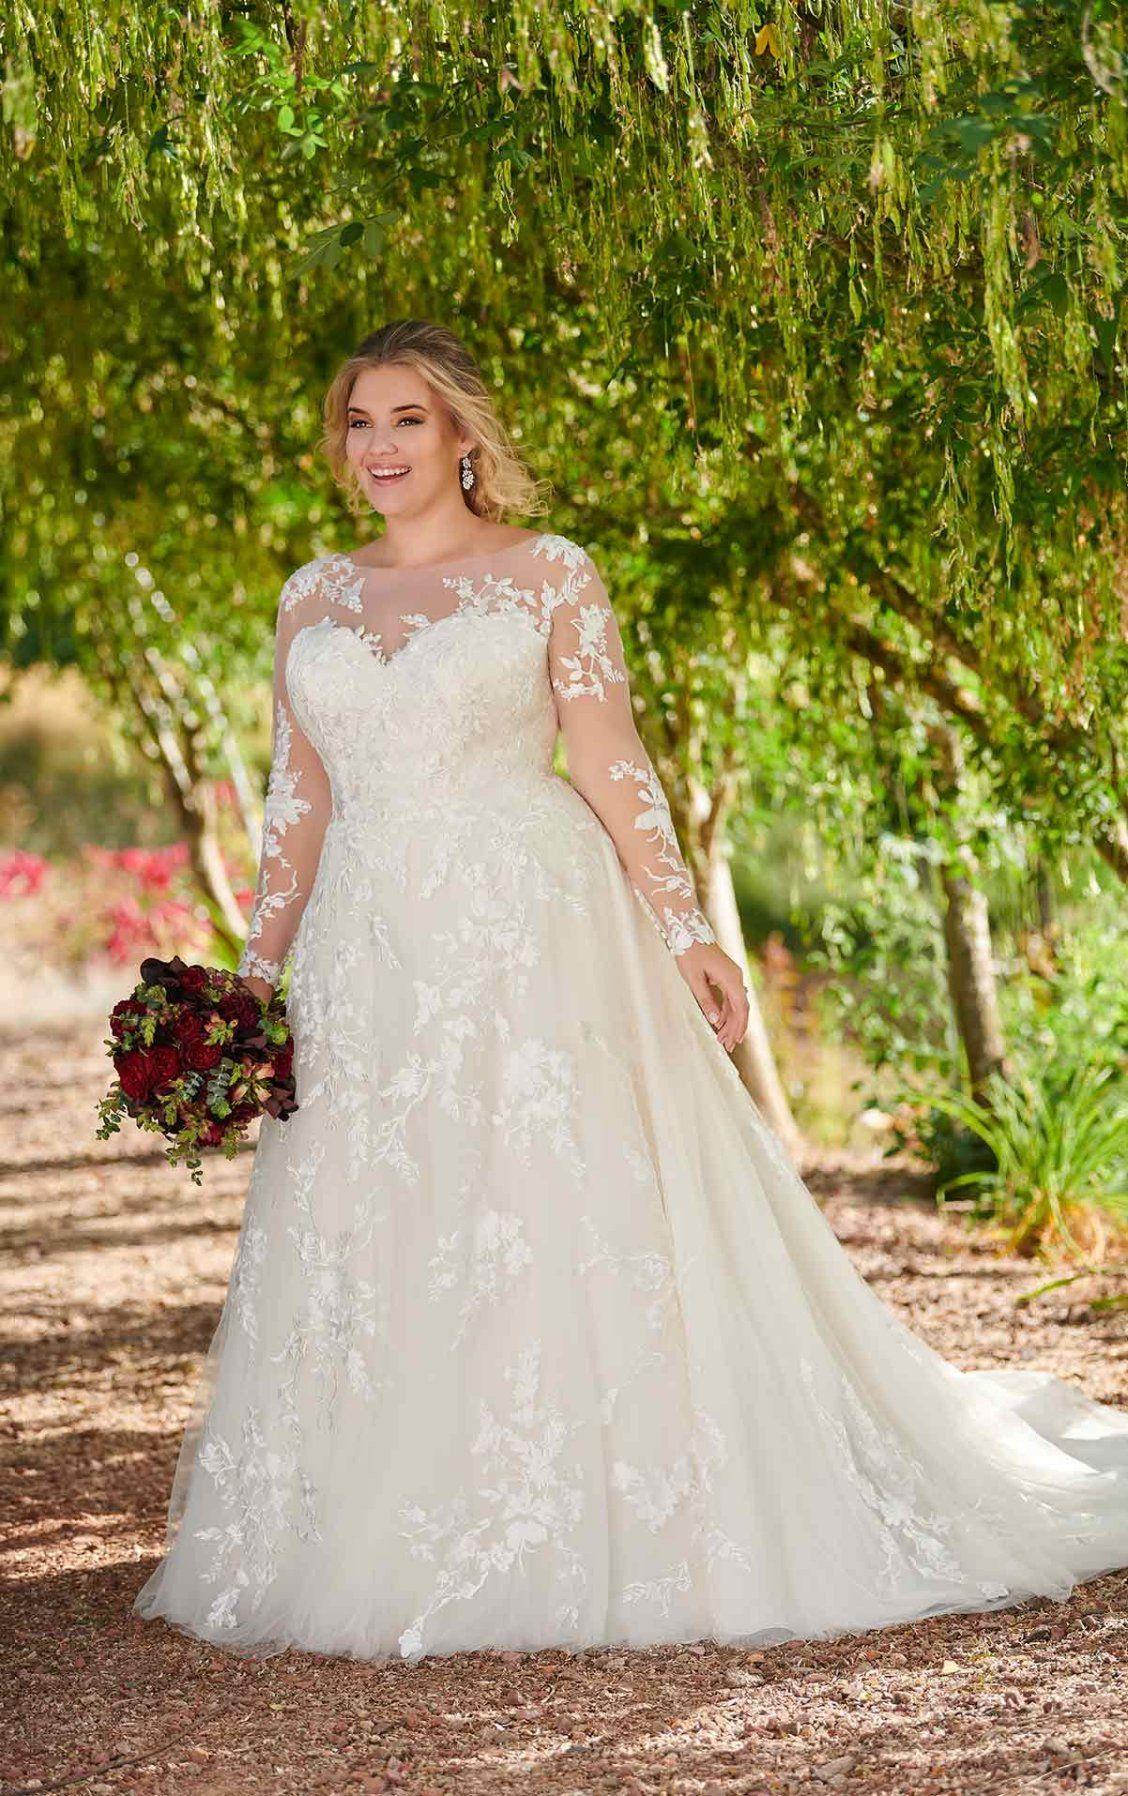 Mermaid wedding dress with rich beadwork plus wedding